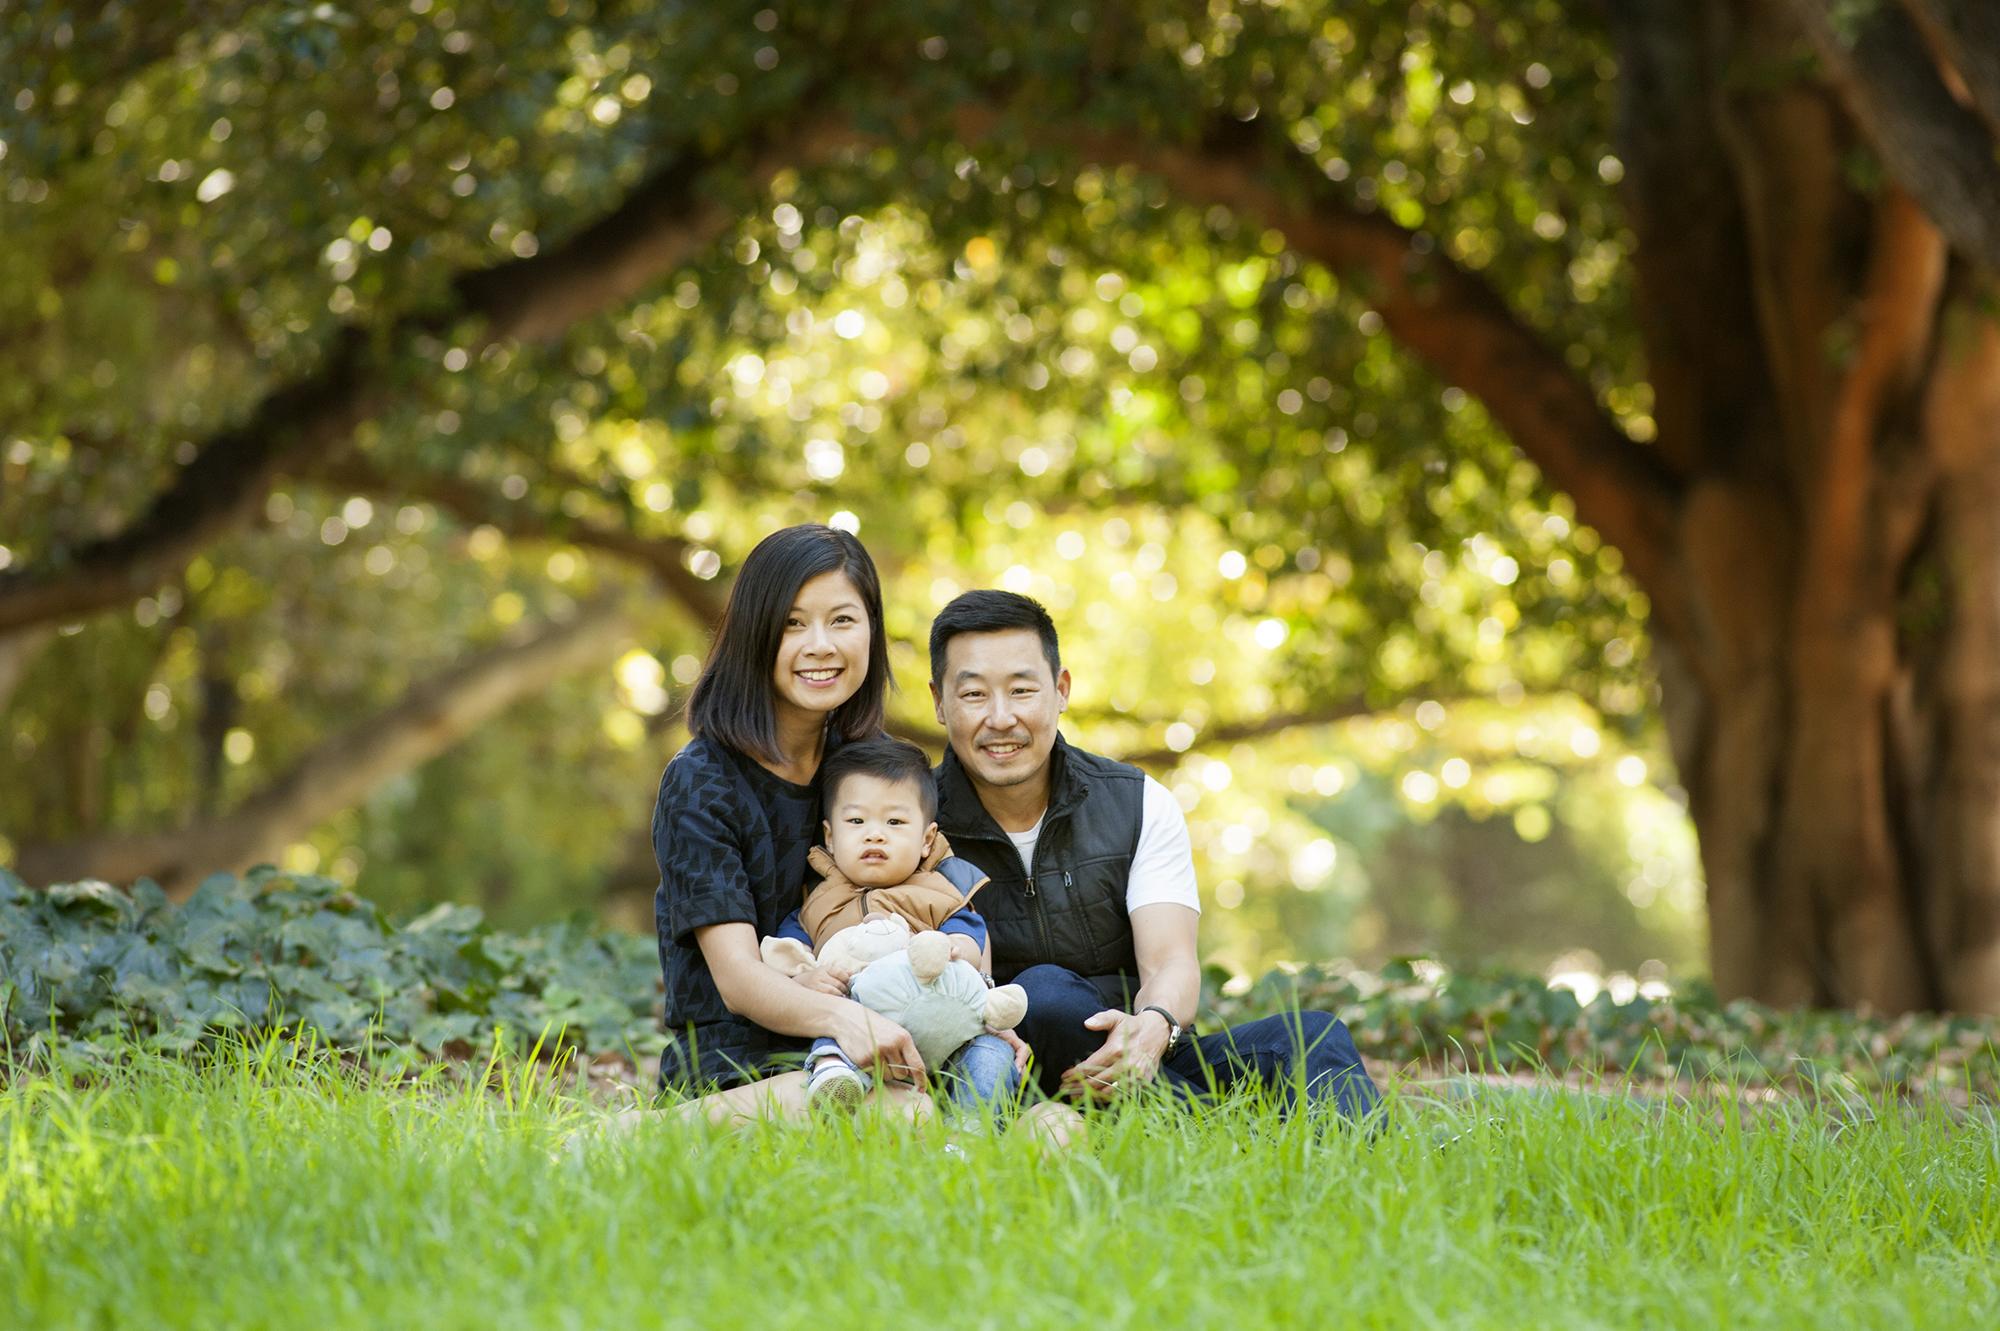 portrait photographer perth hyde park_07.jpg